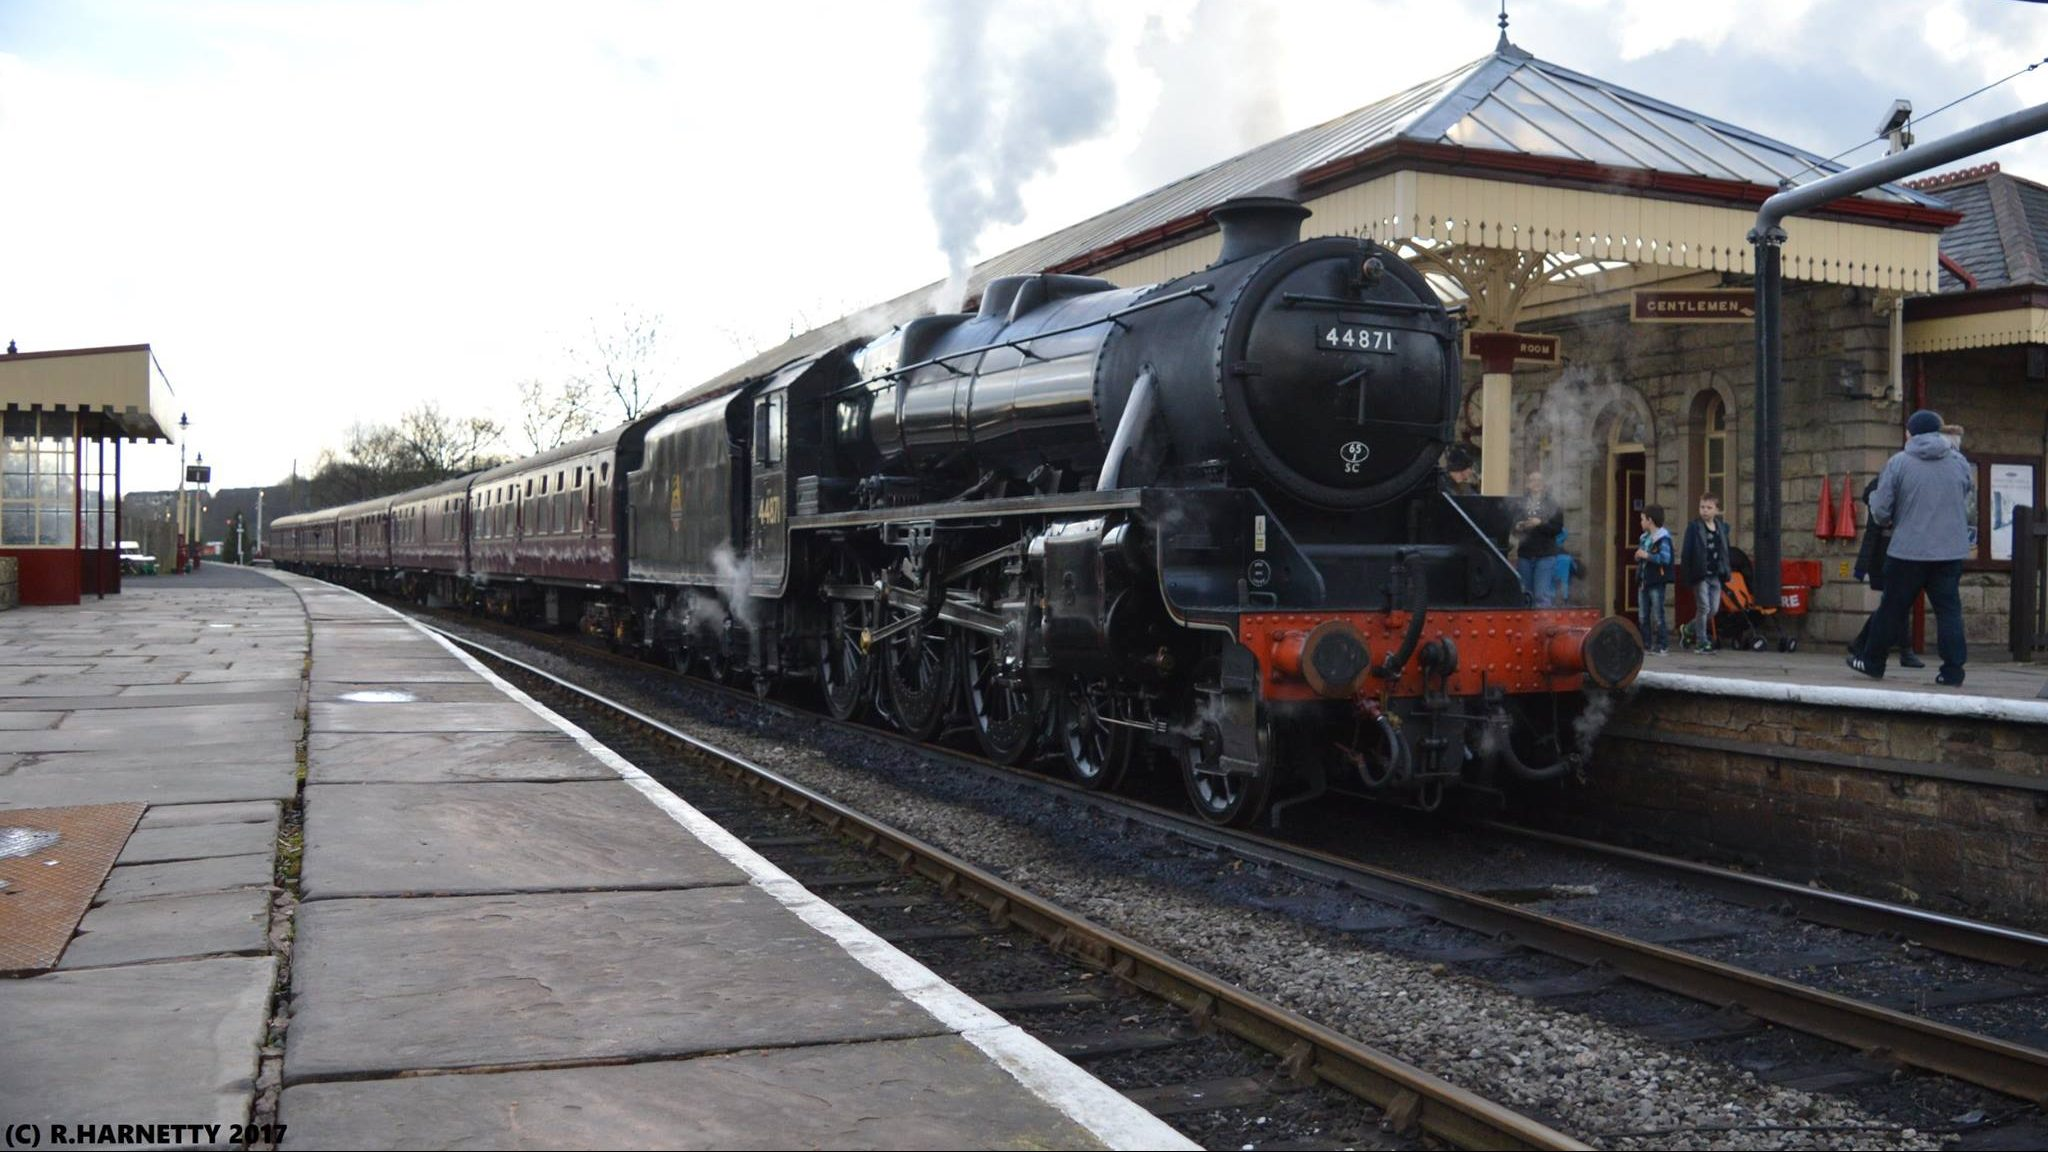 44871 at Ramsbottom on the East Lancashire Railway